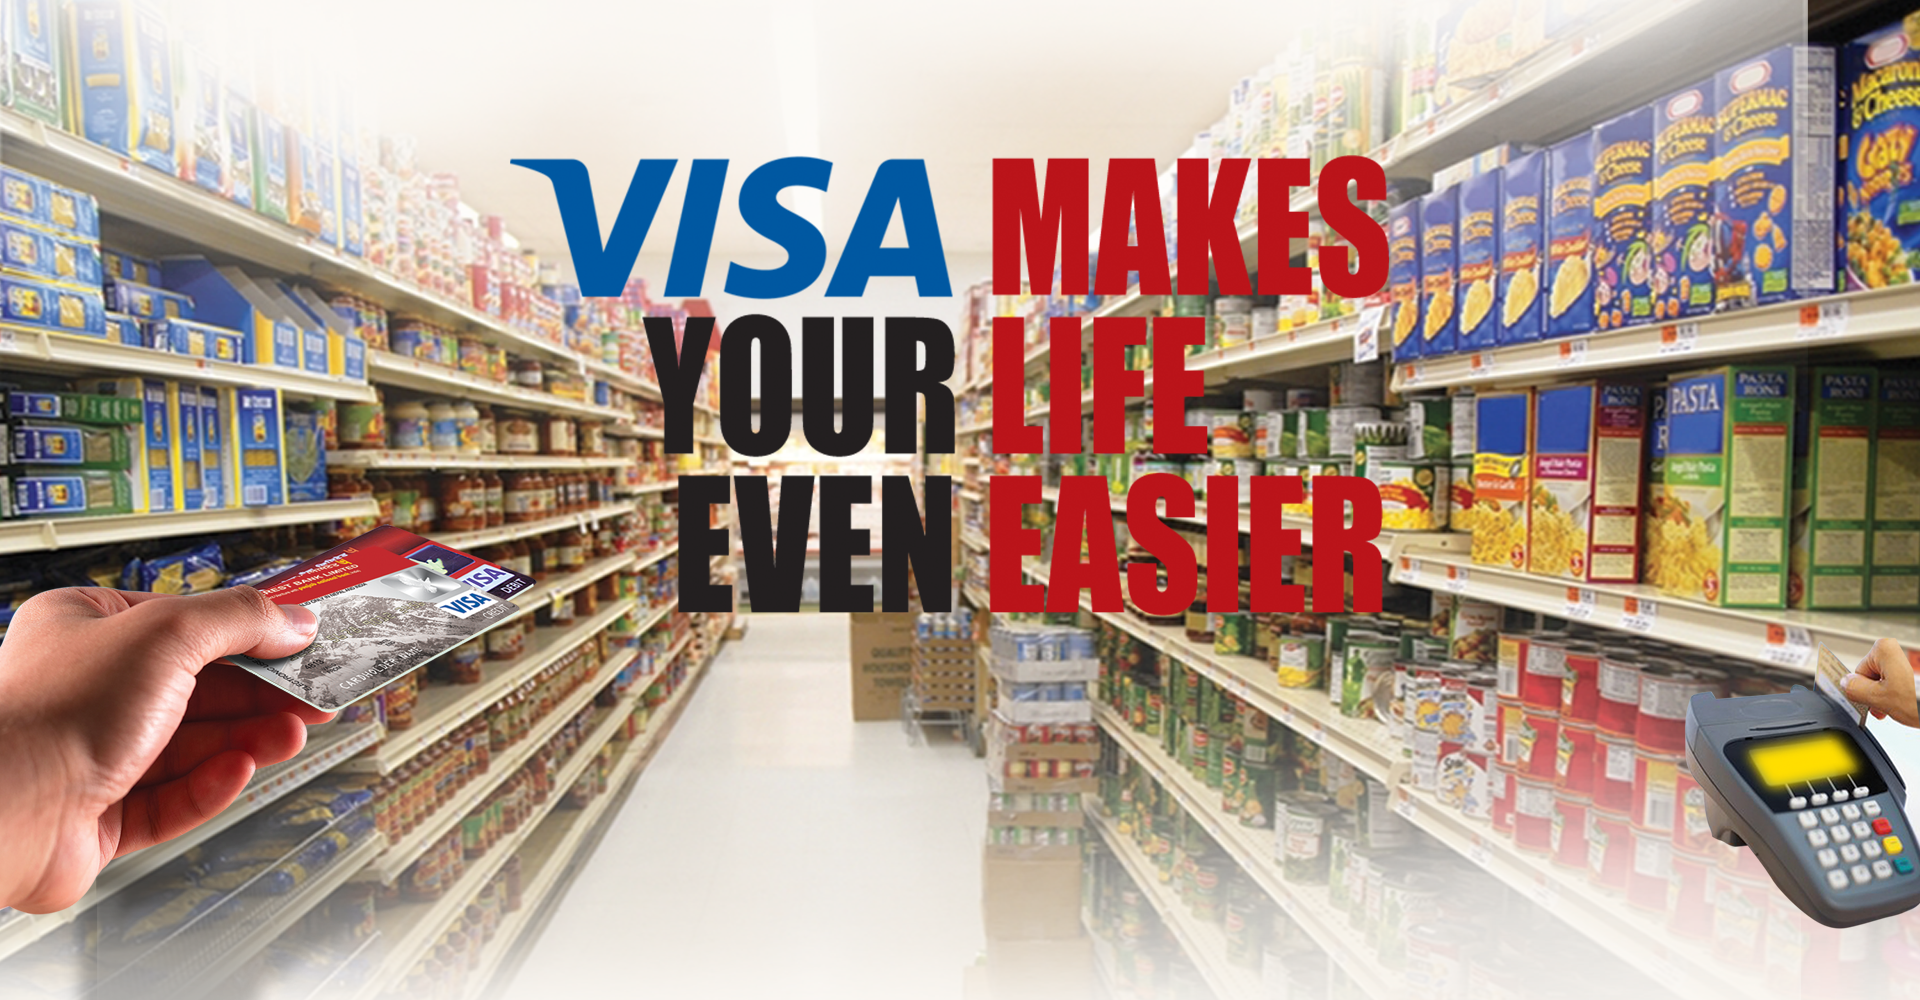 ATM/Card Services